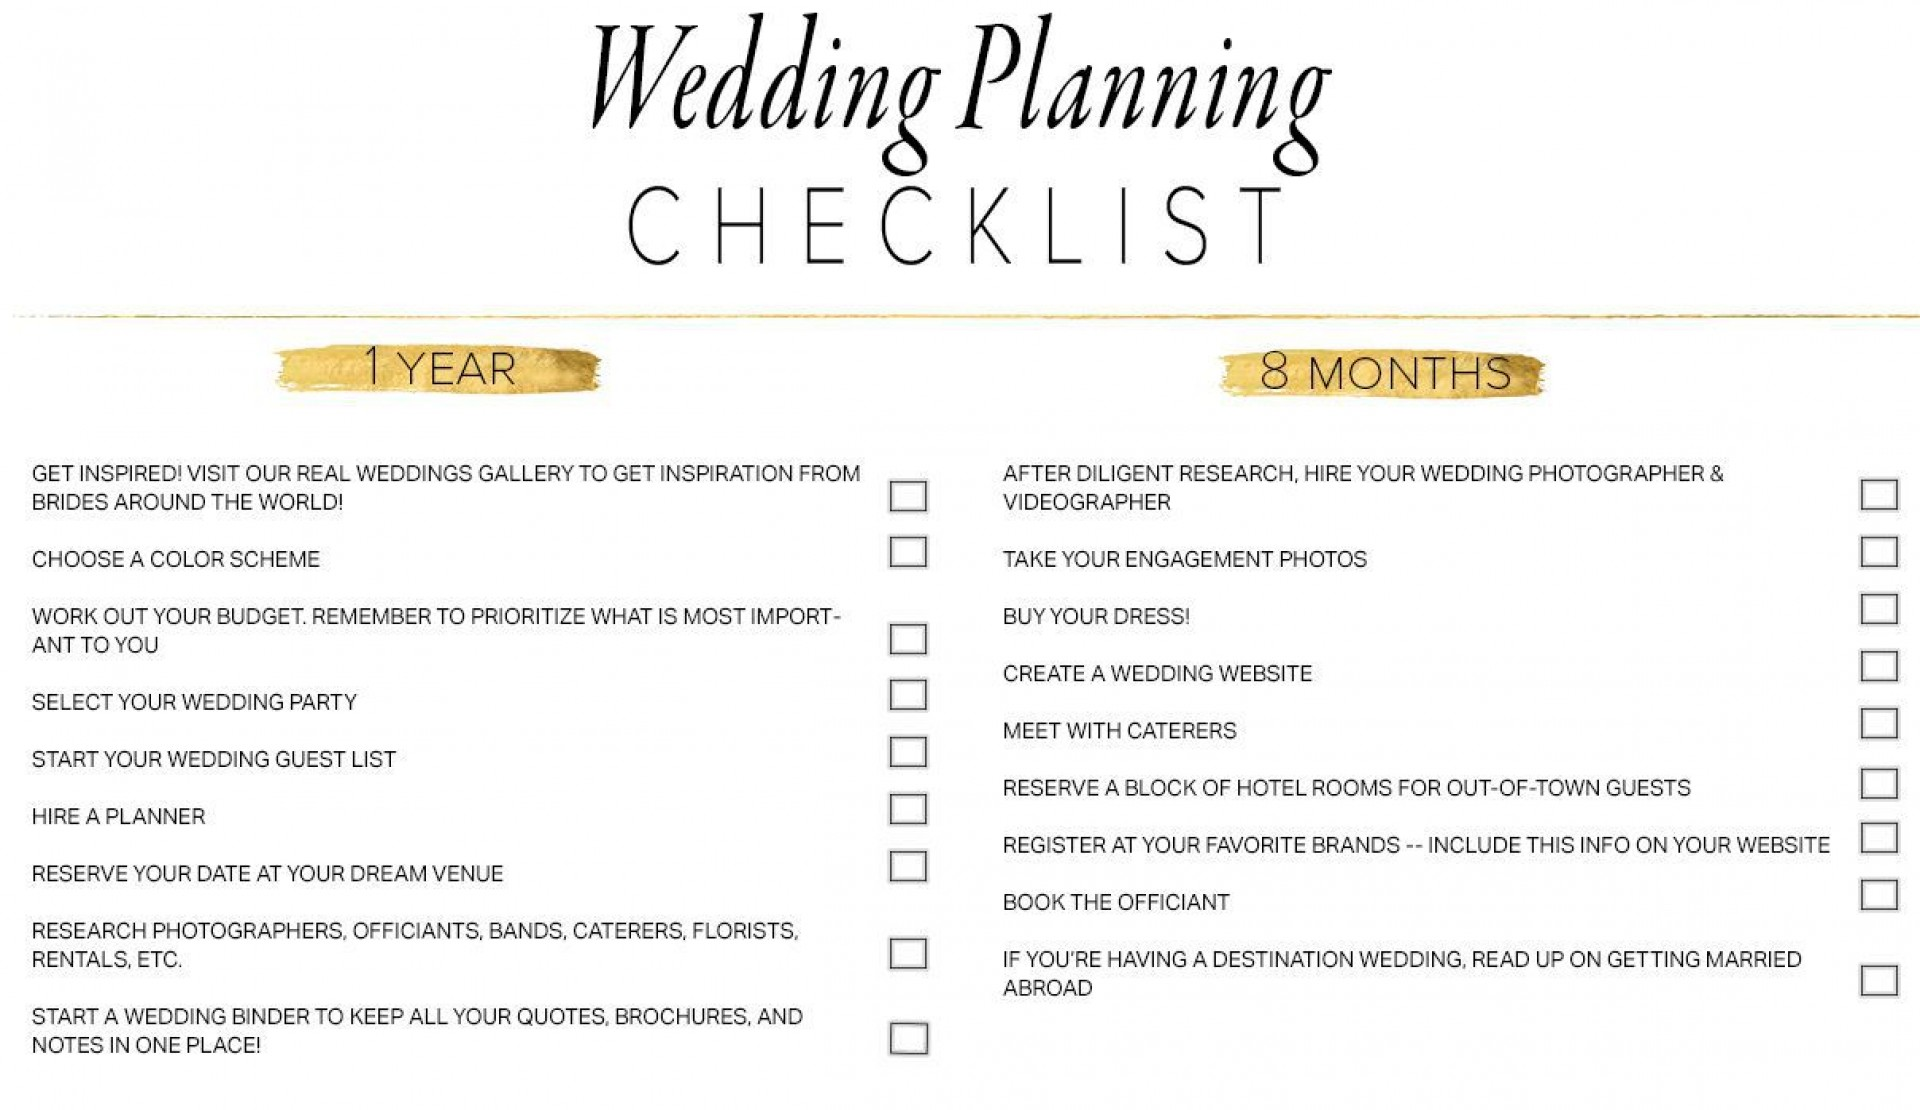 007 Breathtaking Wedding Planning Timeline Template Design  Day Planner Of 6 Month1920